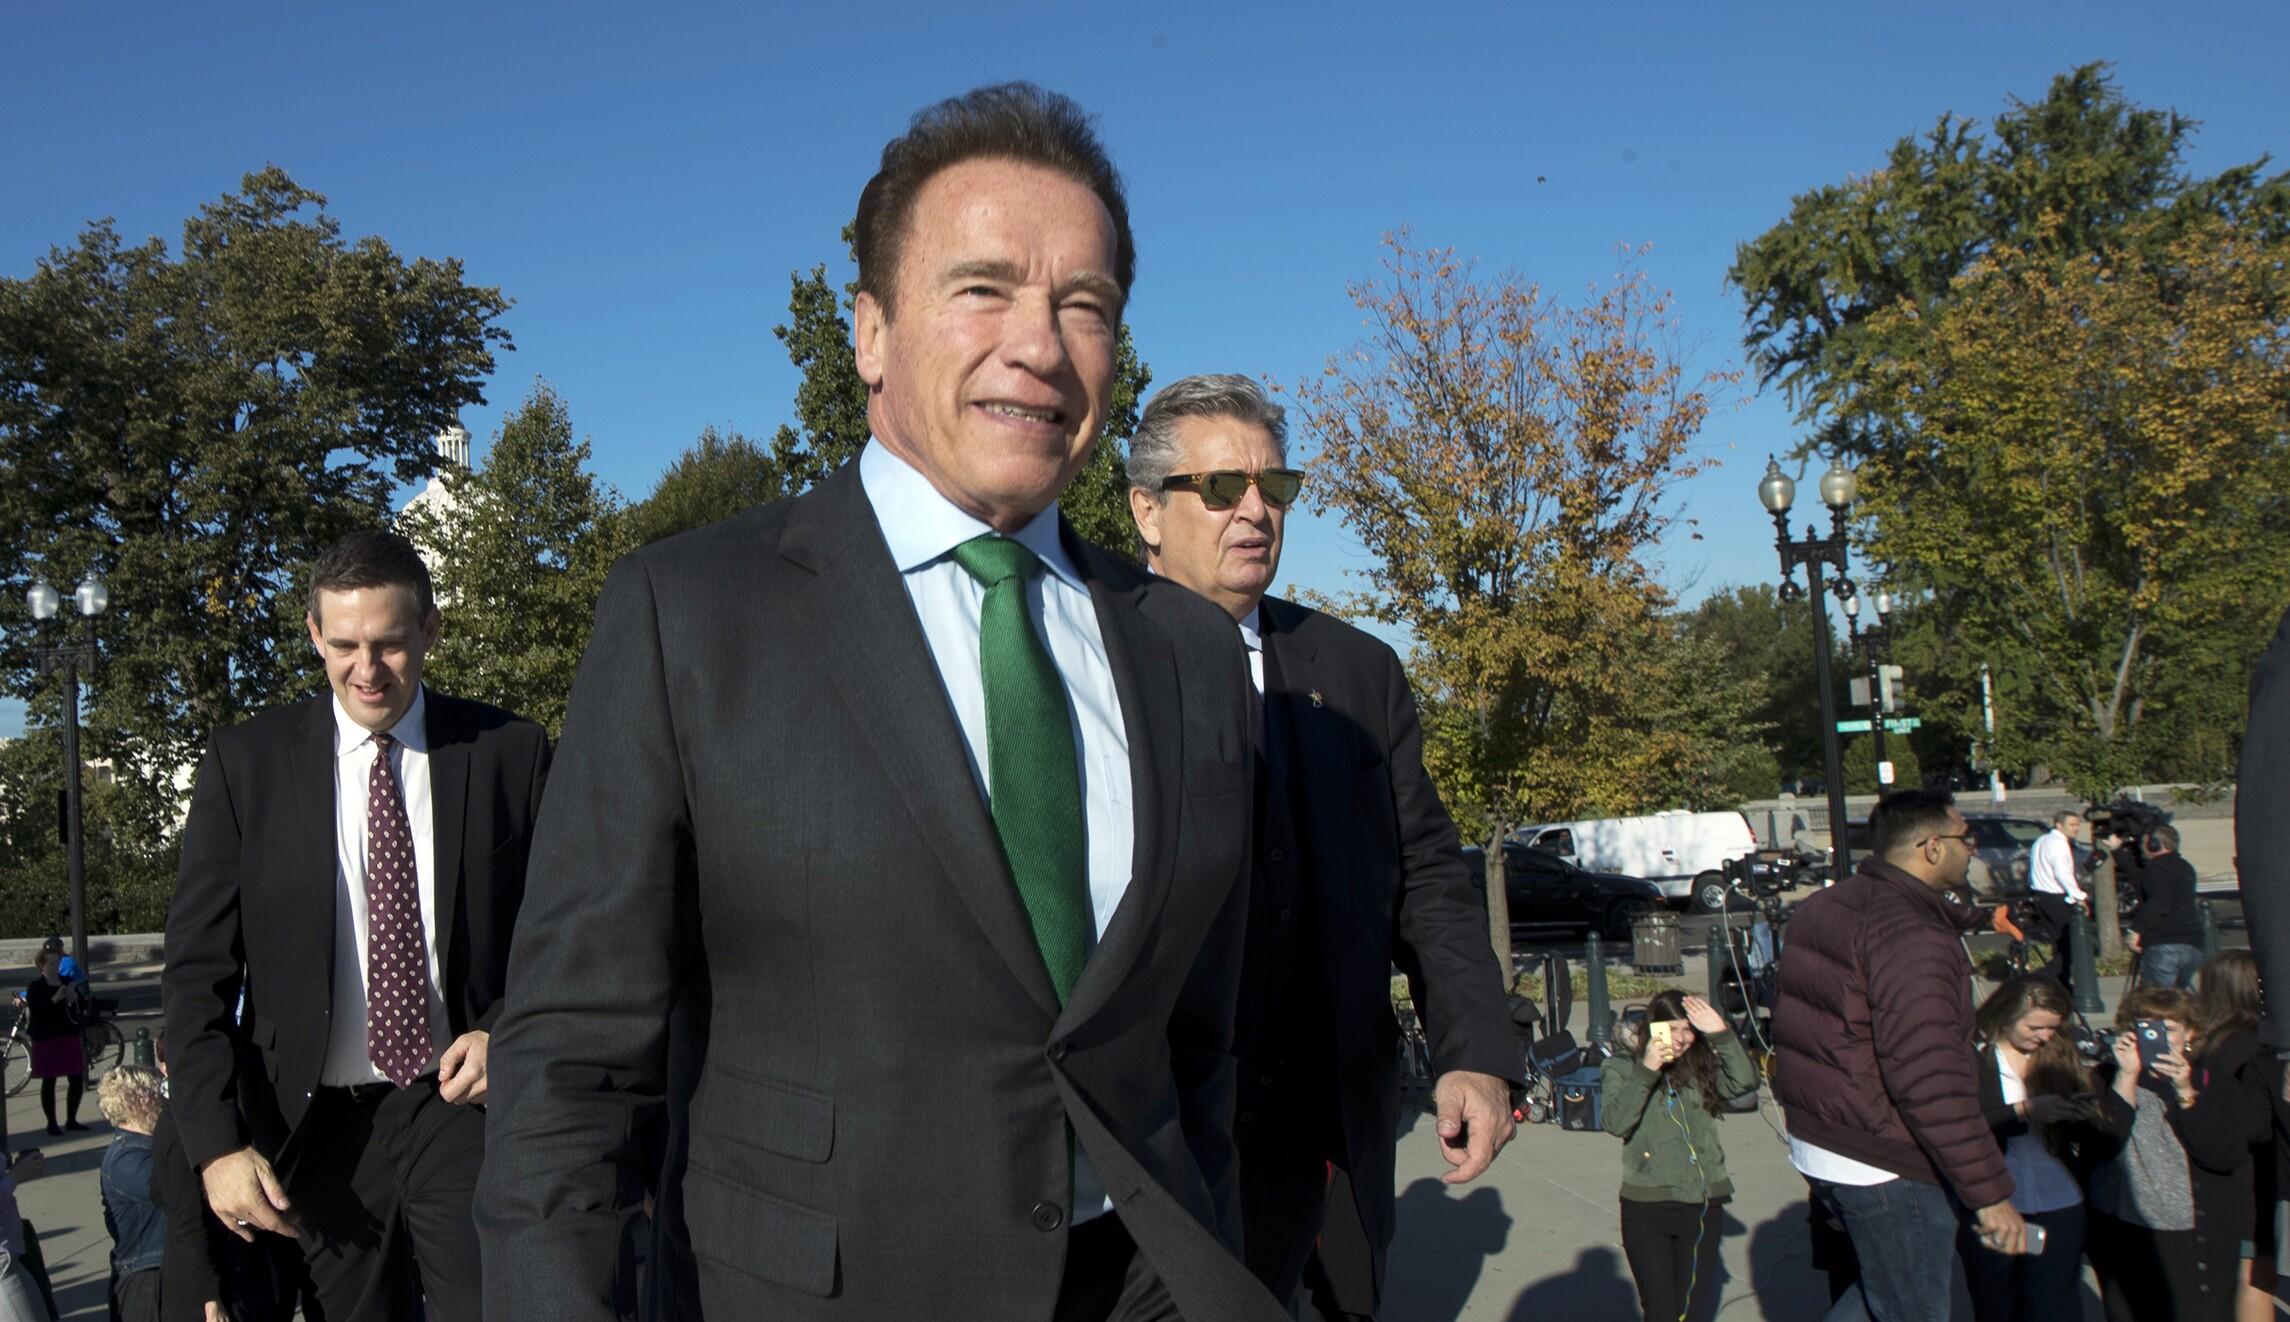 Arnold Schwarzenegger Calls On Supreme Court To Terminate